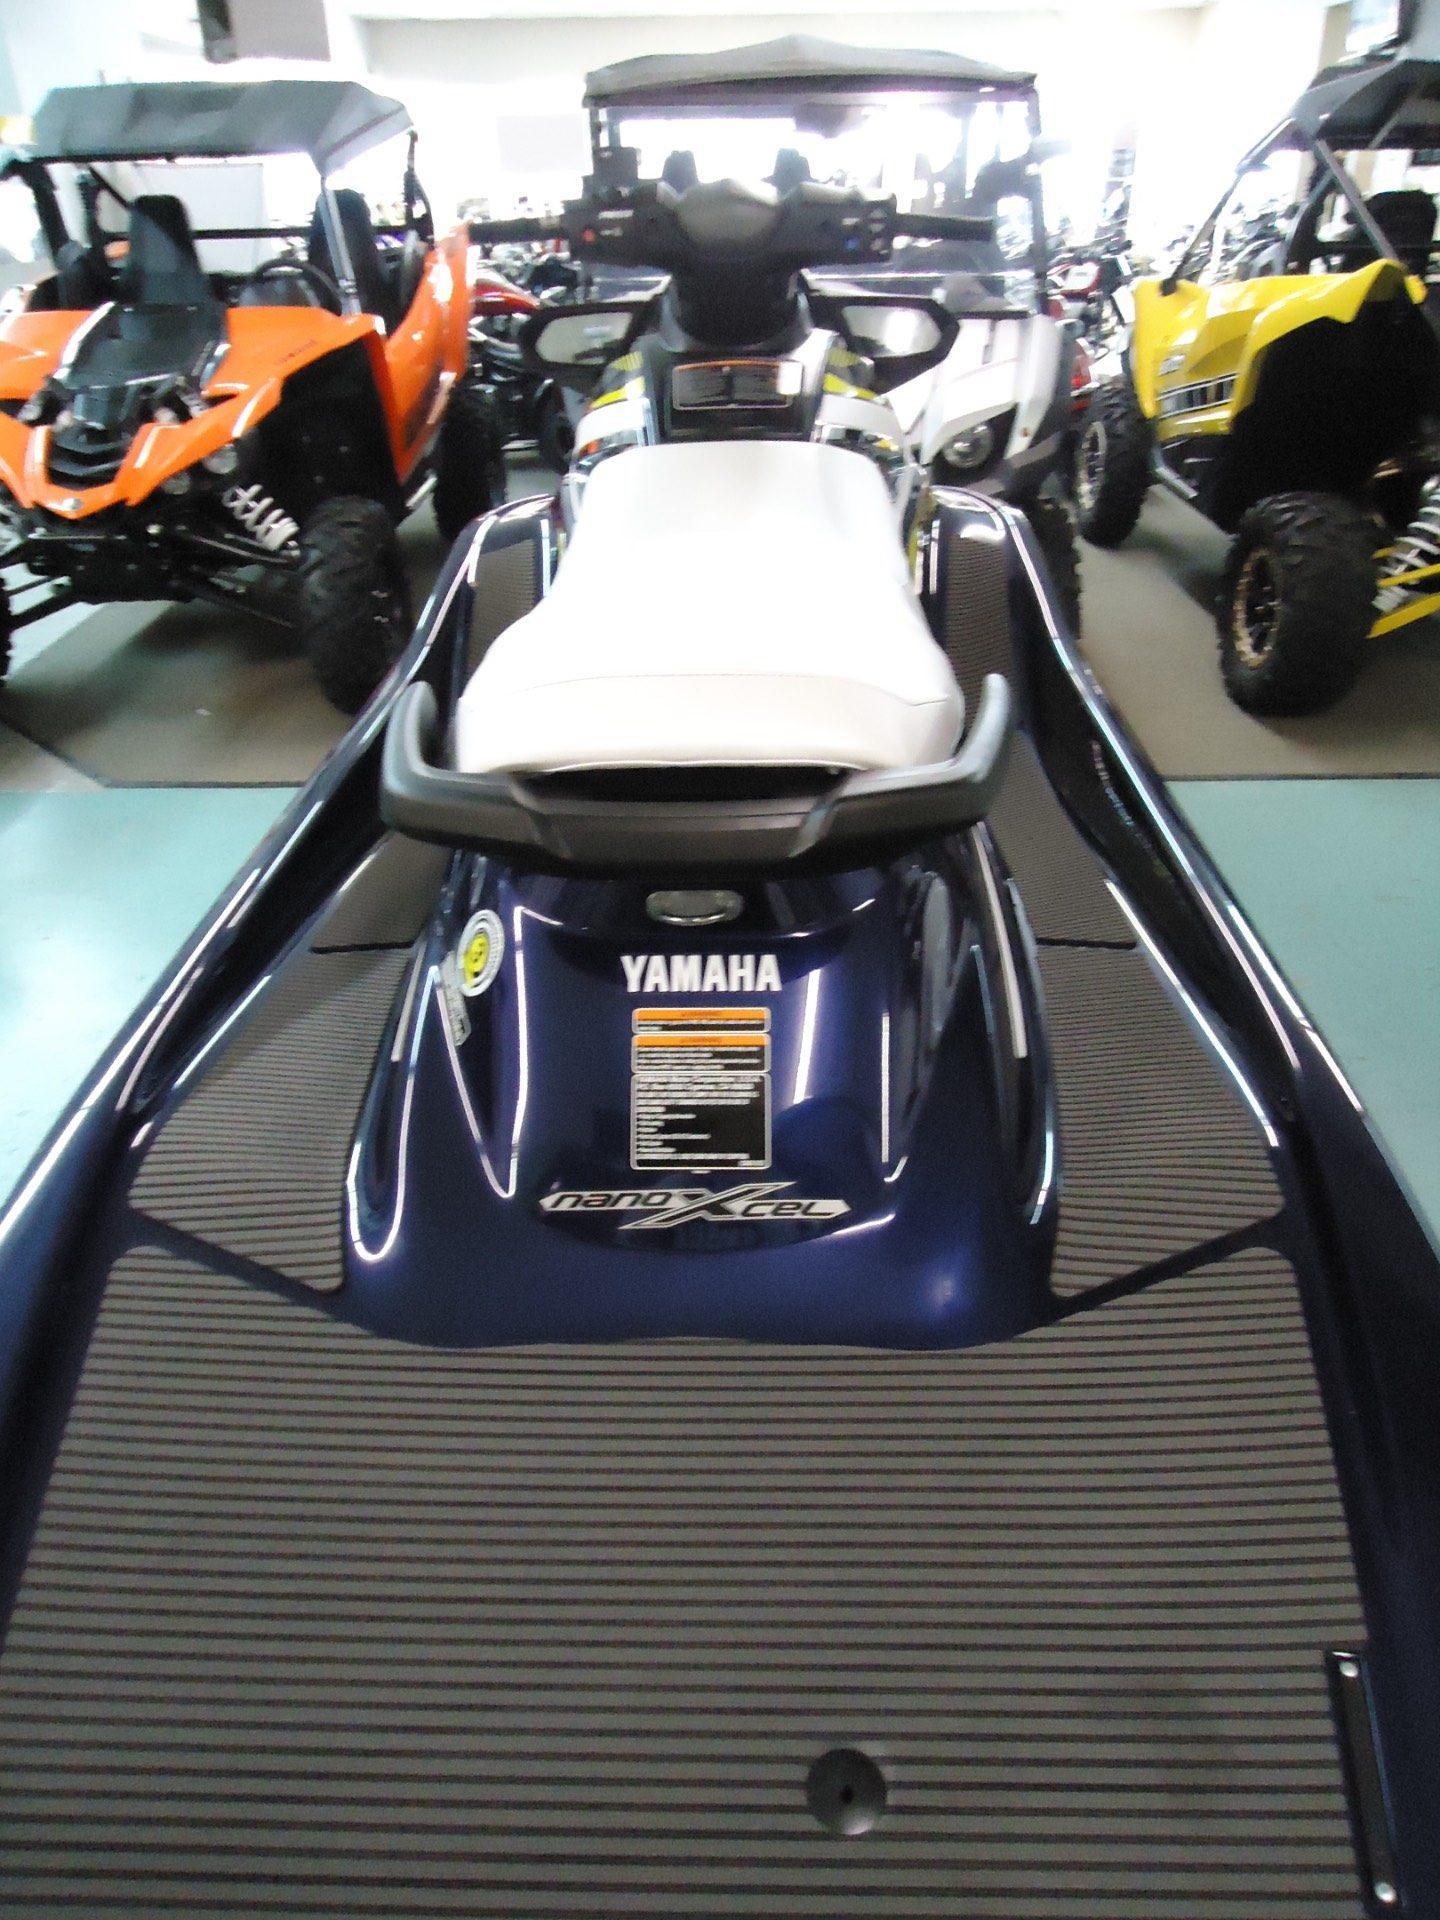 2017 Yamaha VX Deluxe 3